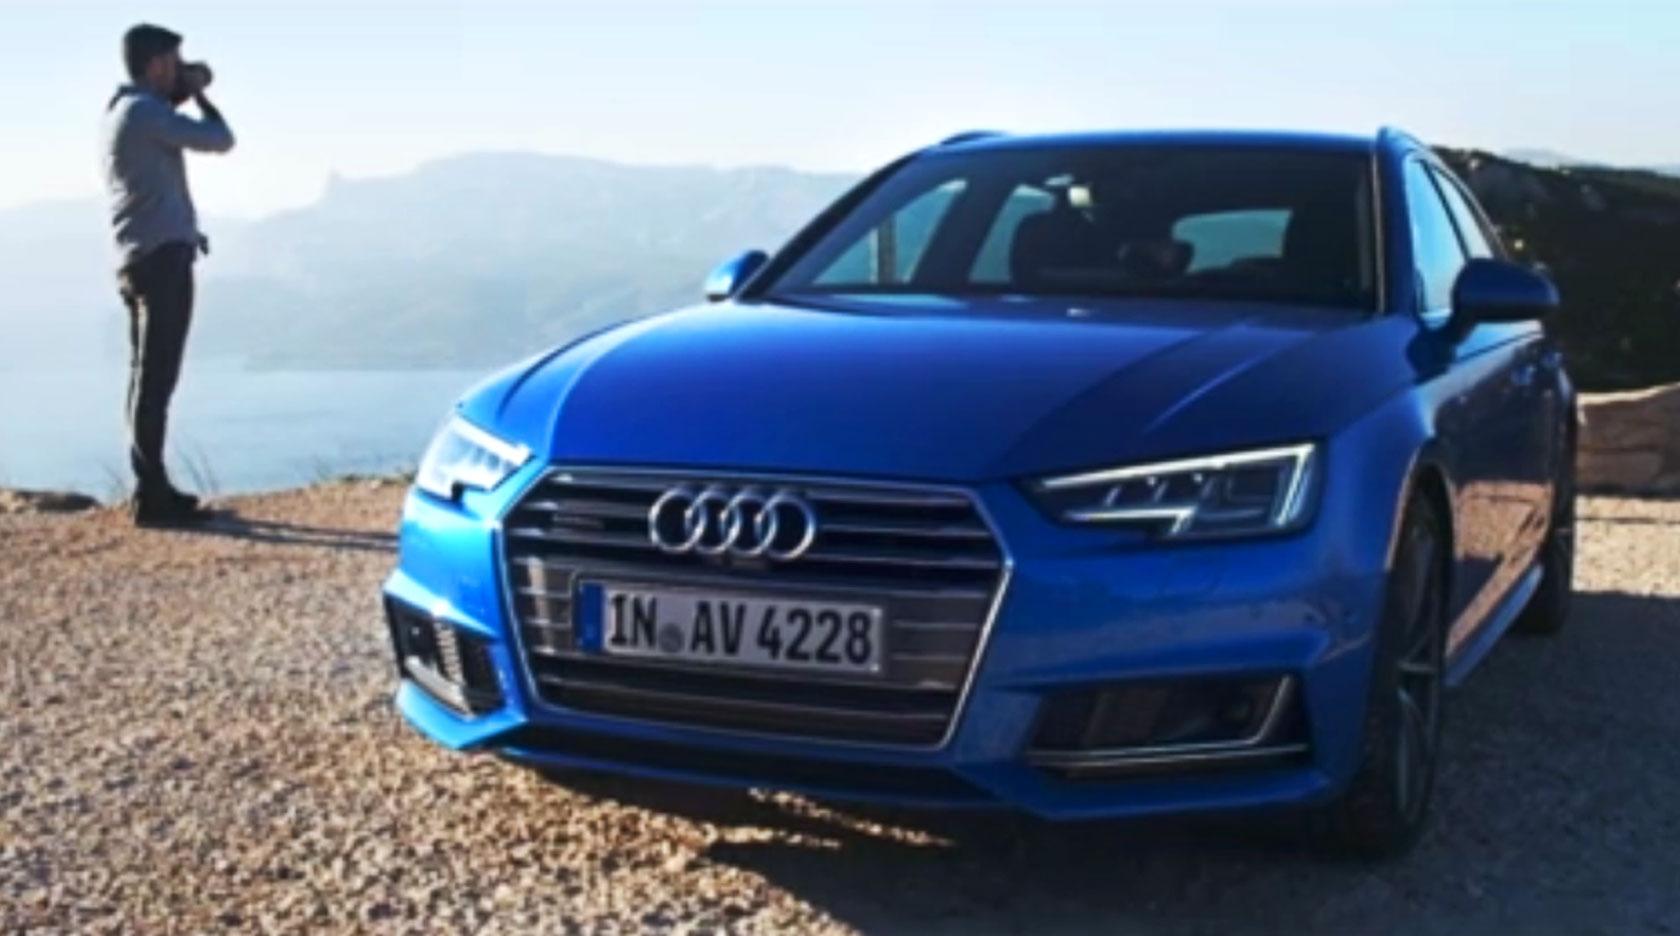 Audi A4 Drone Effect